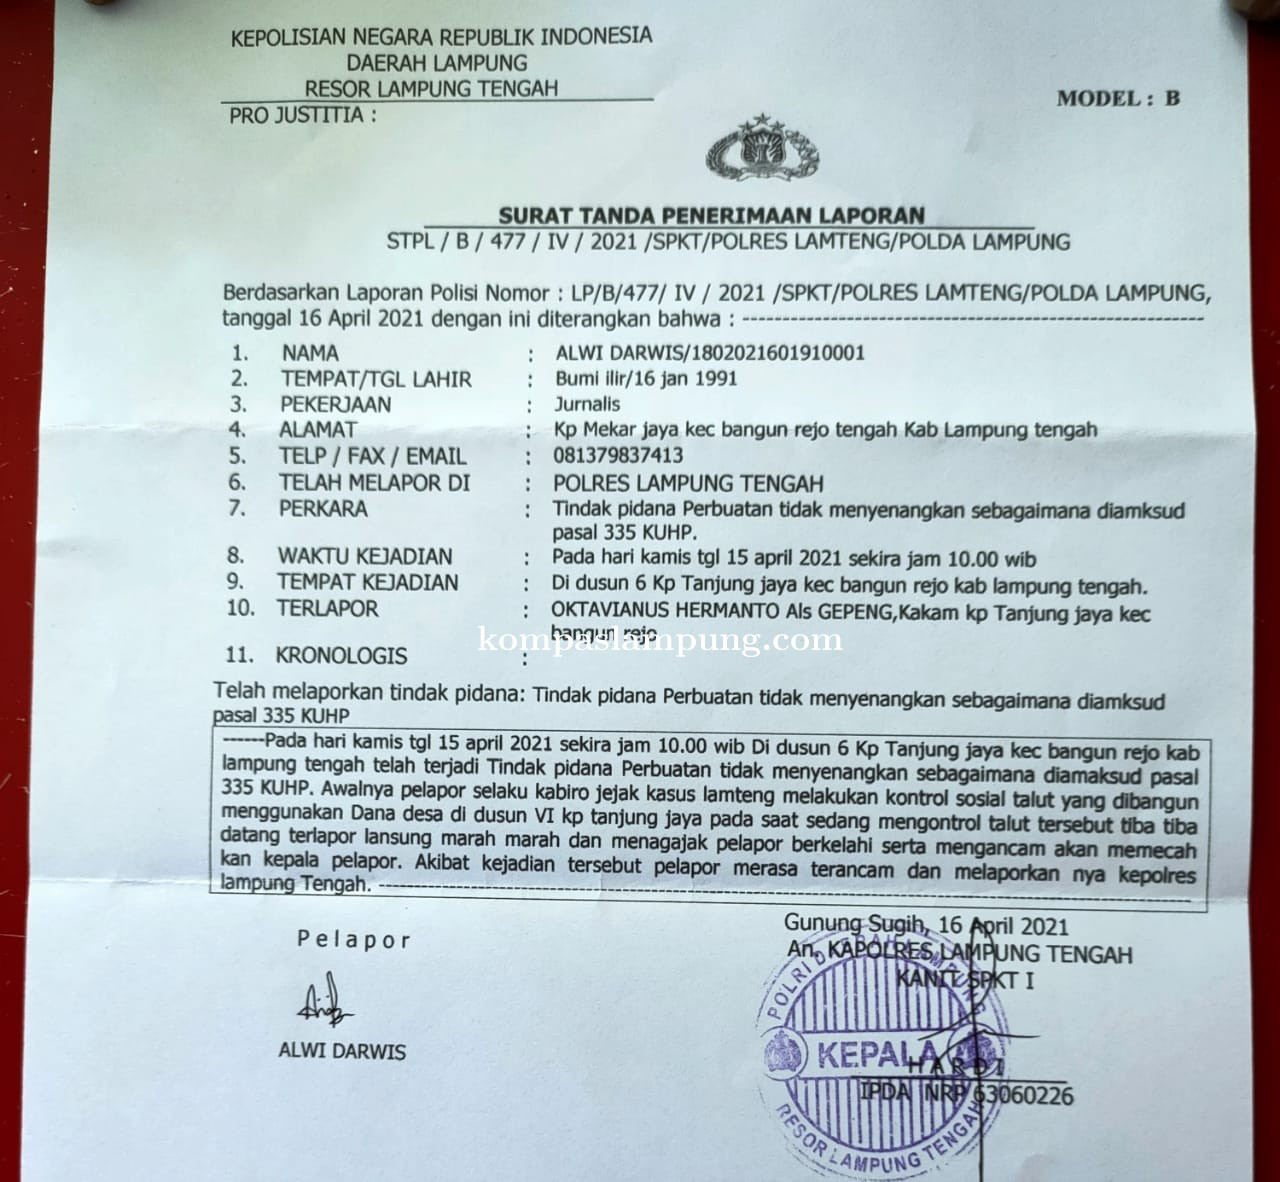 Forum Jurnalis Seputih Barat (FJSB) Lamteng Akan Lakukan Aksi Damai Kawal Kasus Intimidasi Wartawan.